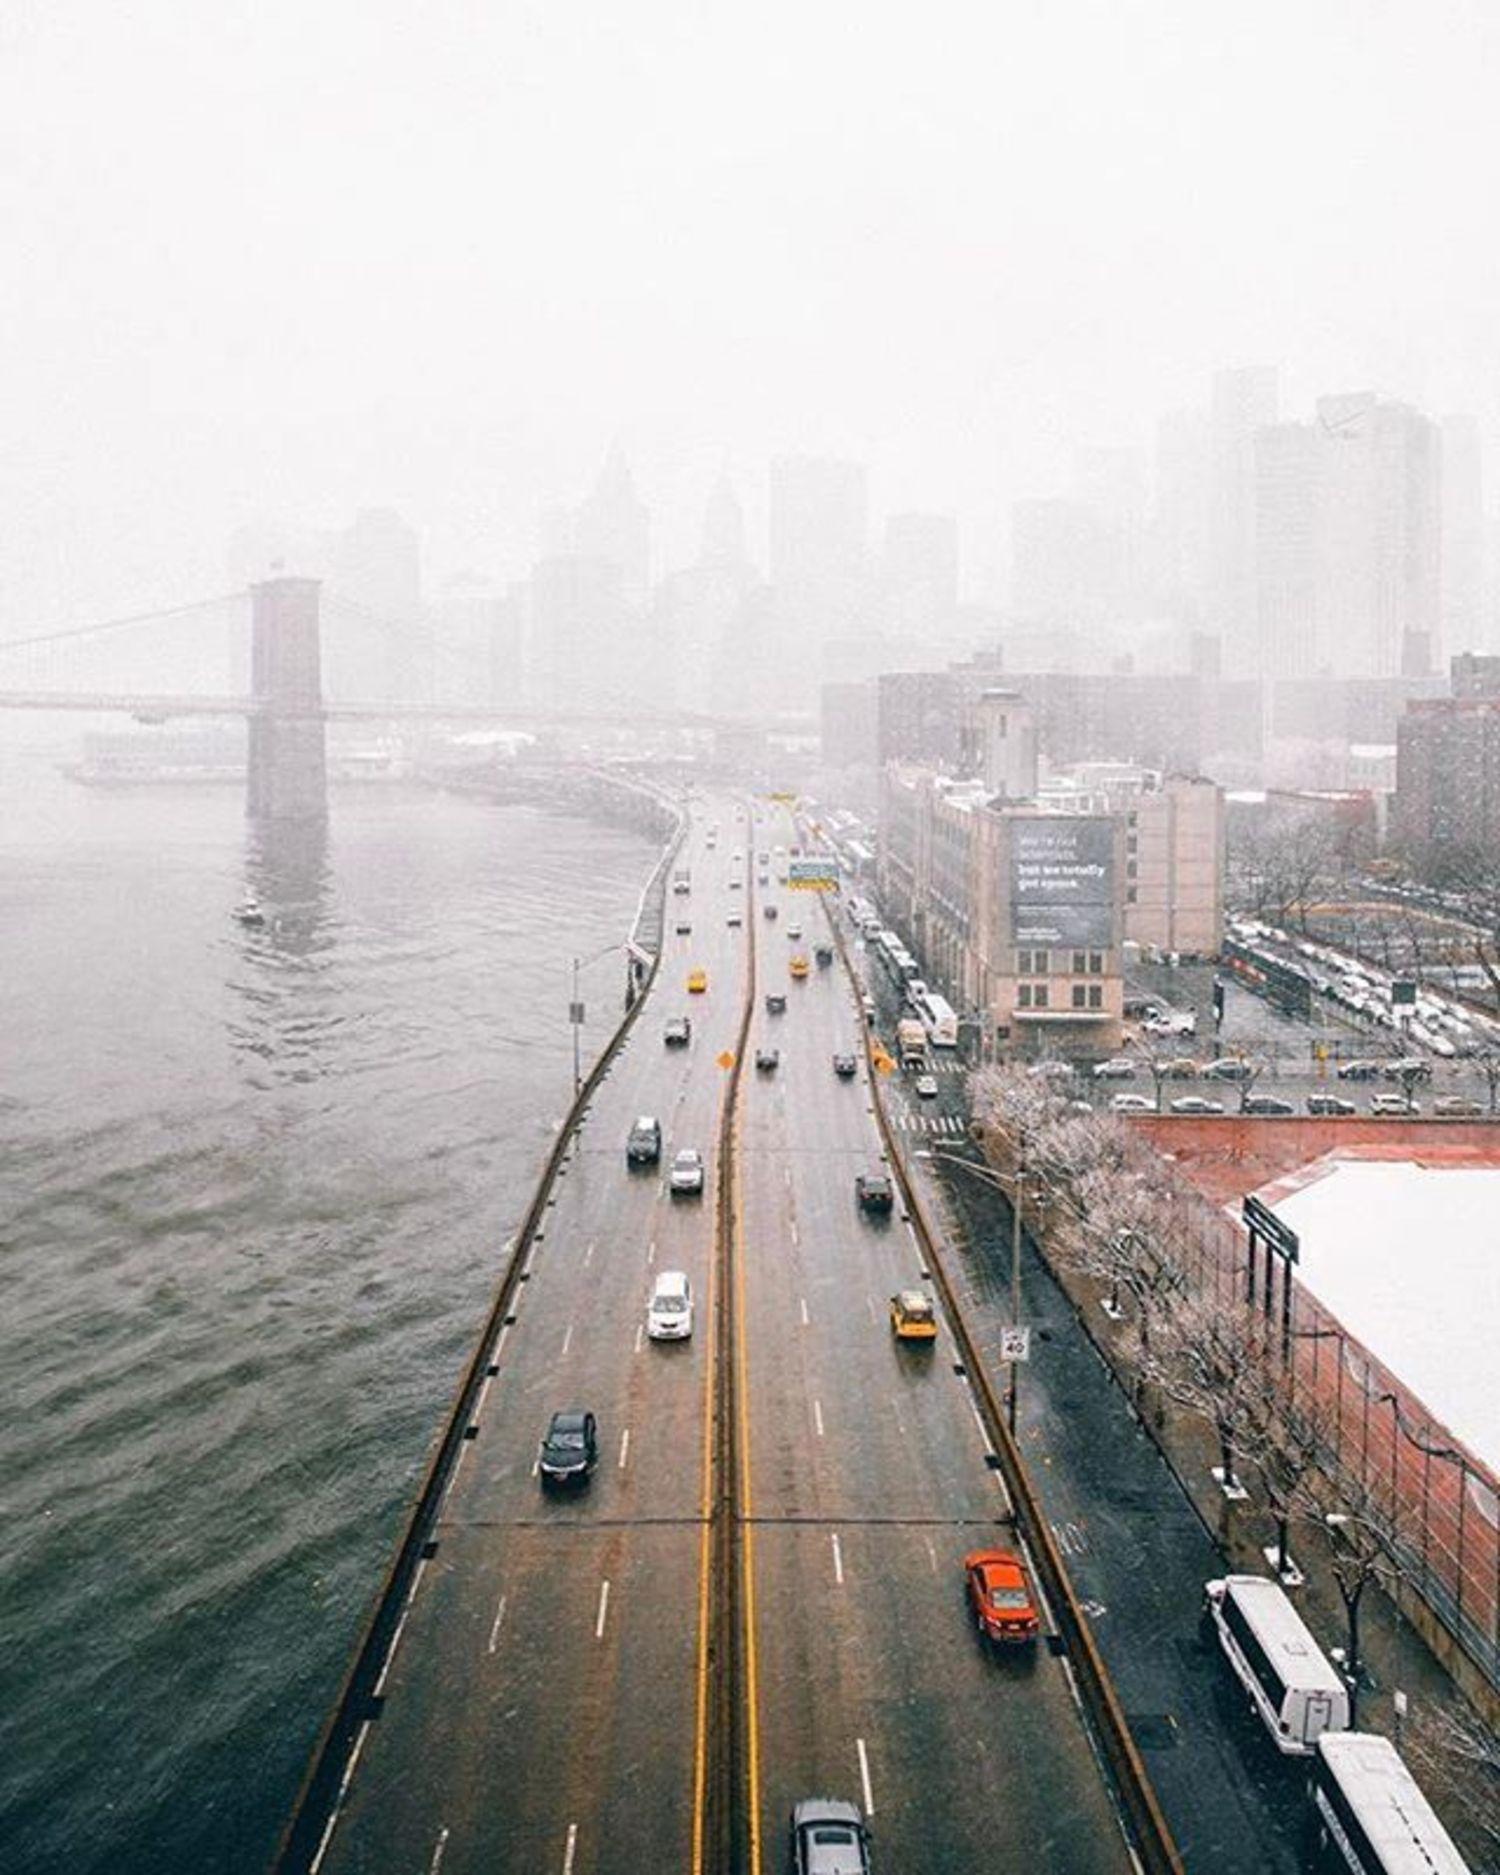 New York, New York. Photo via @henrykornaros  #viewingnyc